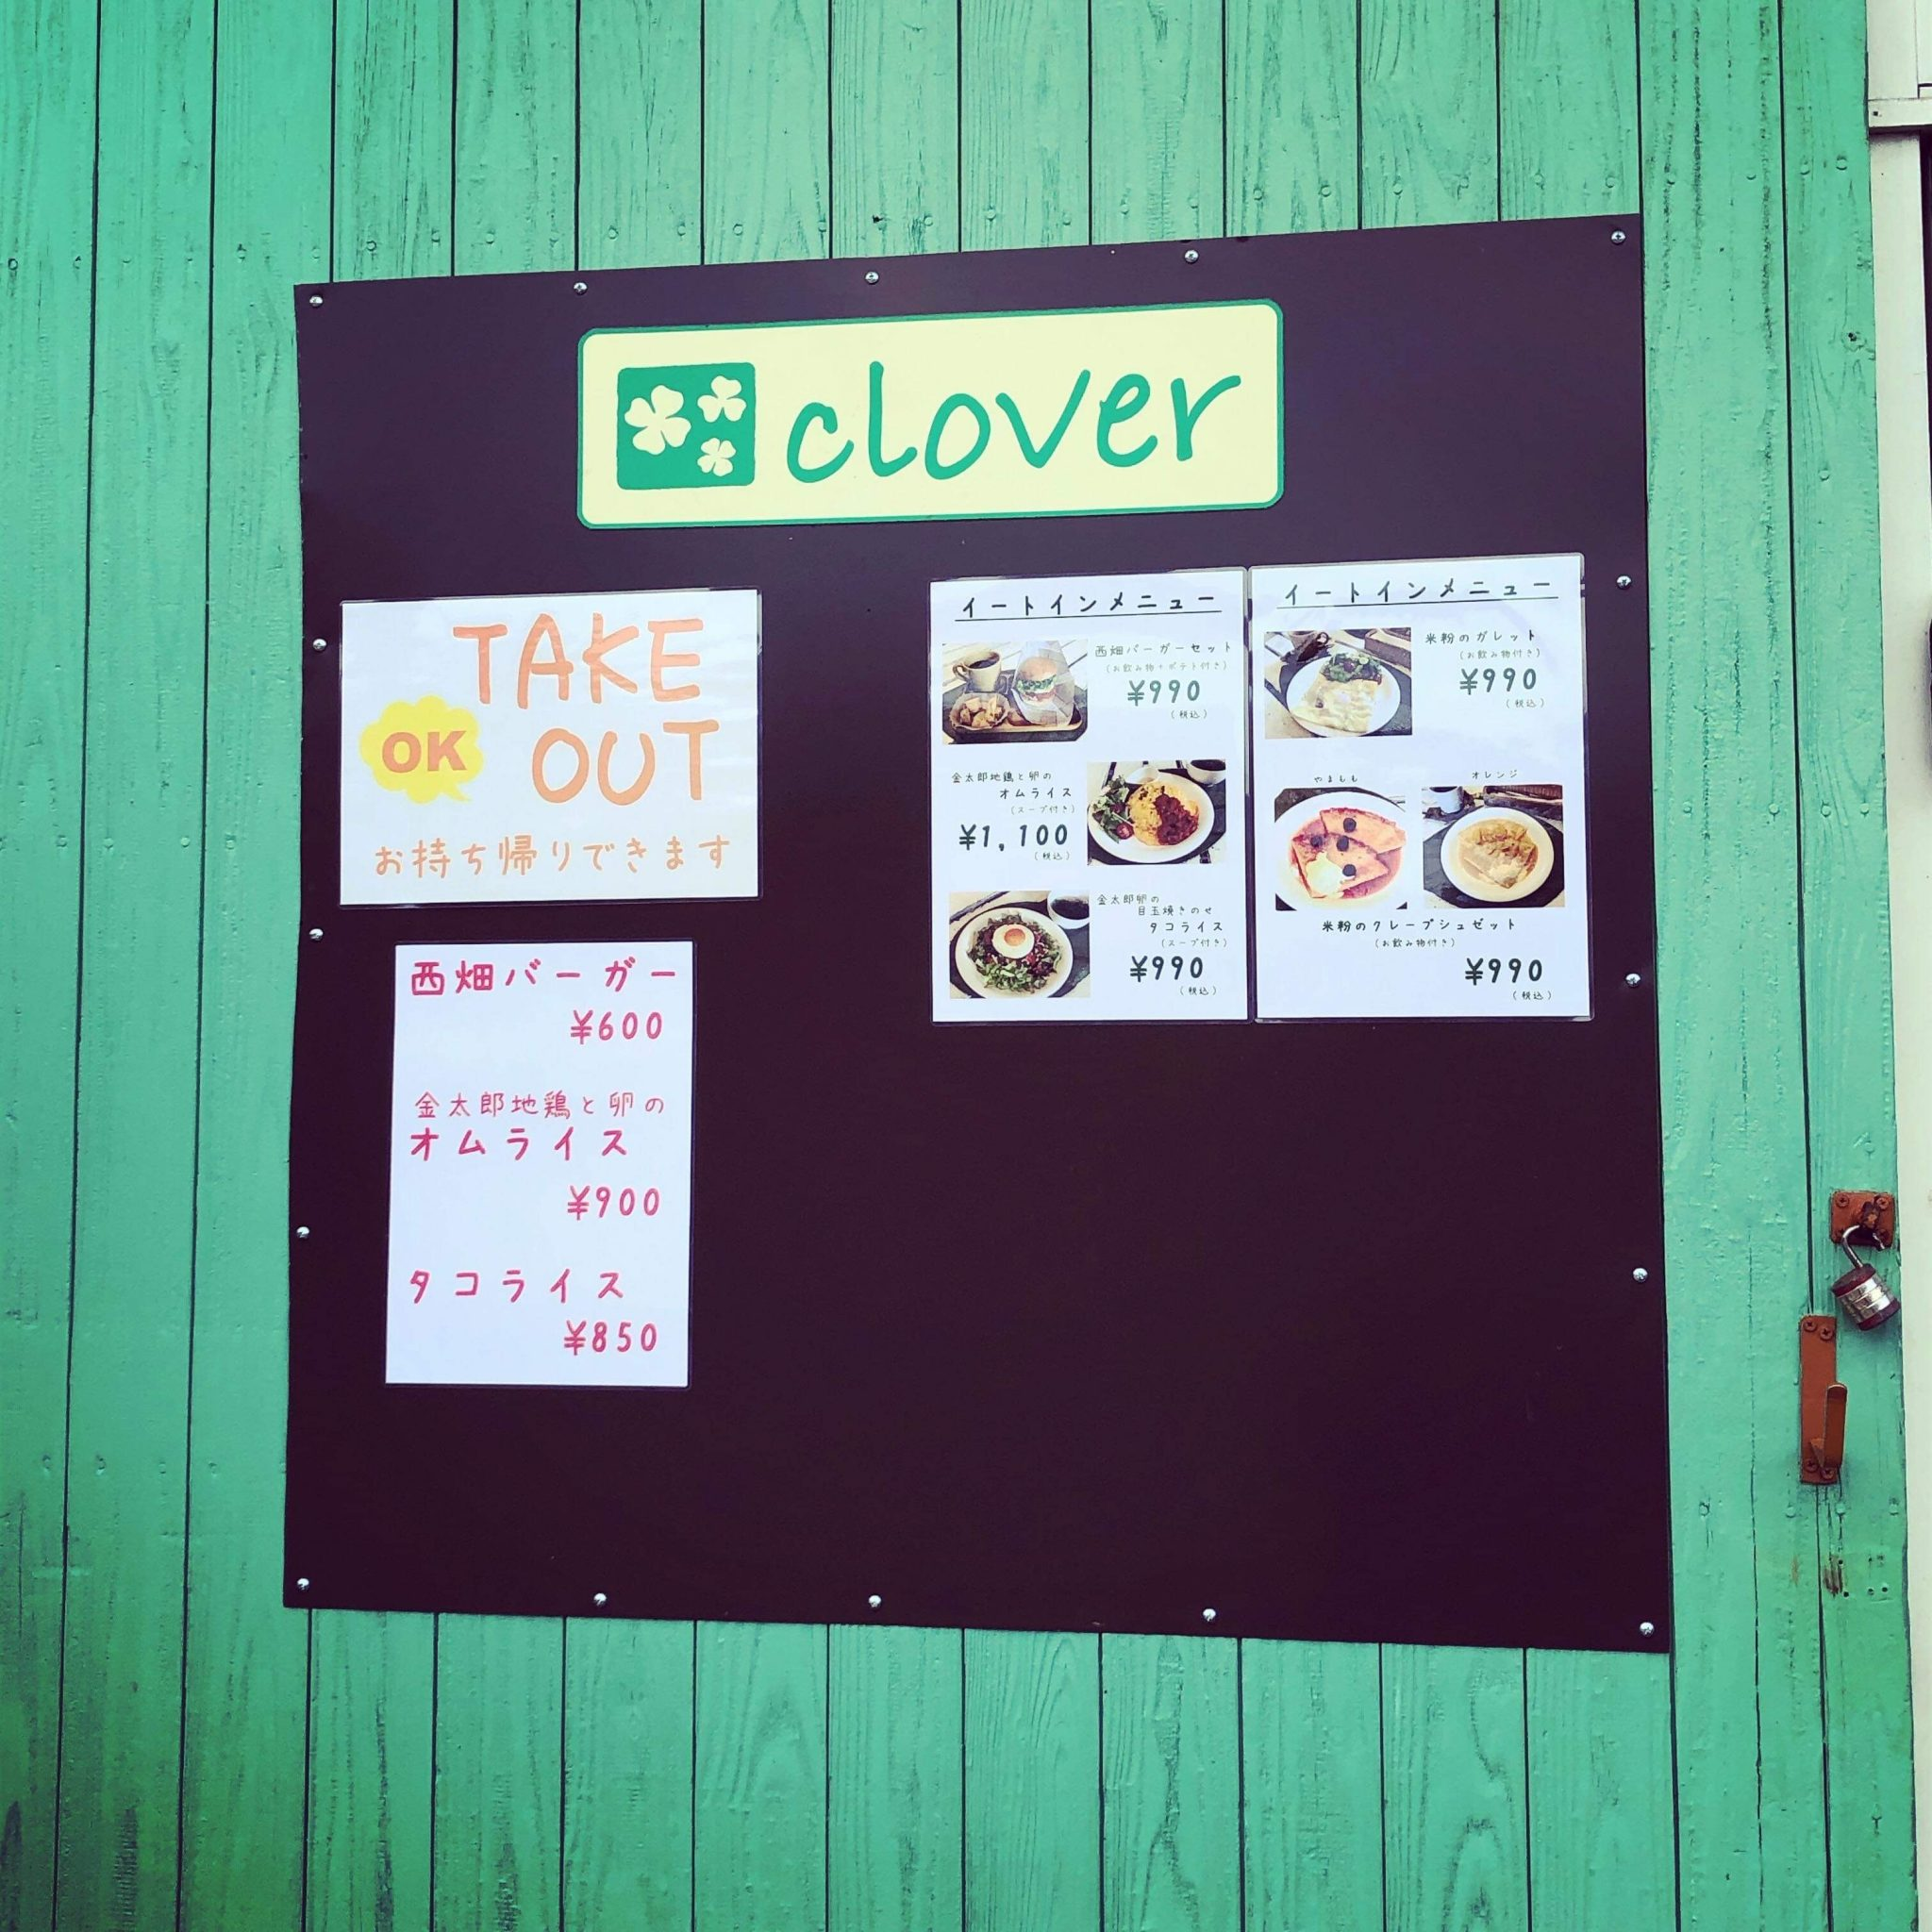 clover|那珂川市商工会 ももちゃんネット